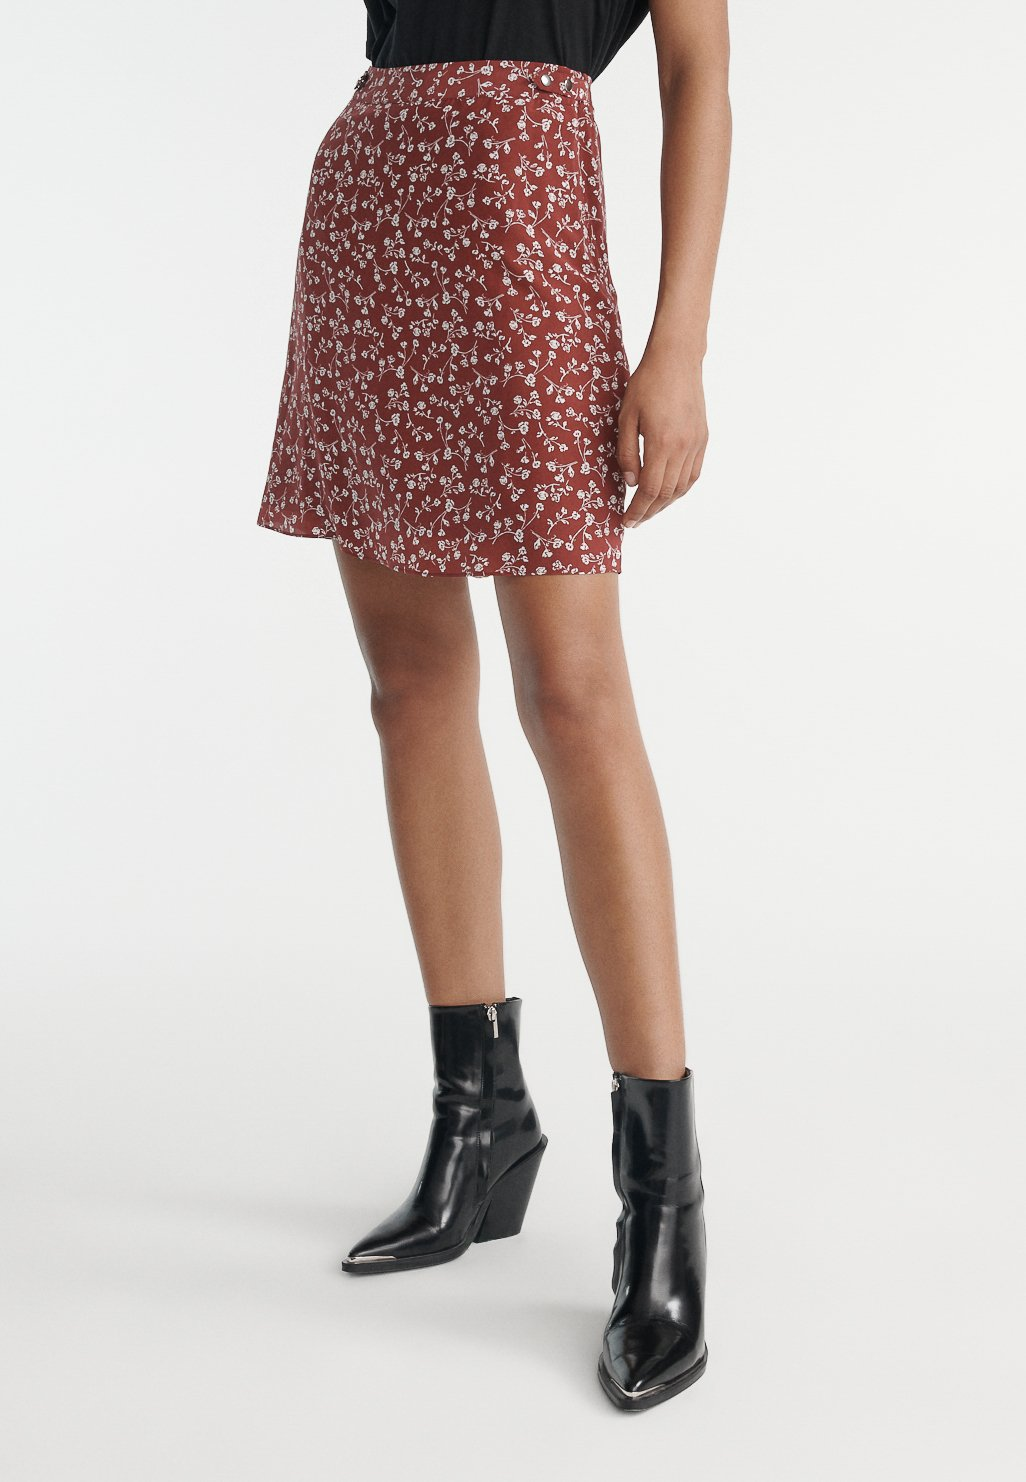 Femme JUPE - Minijupe